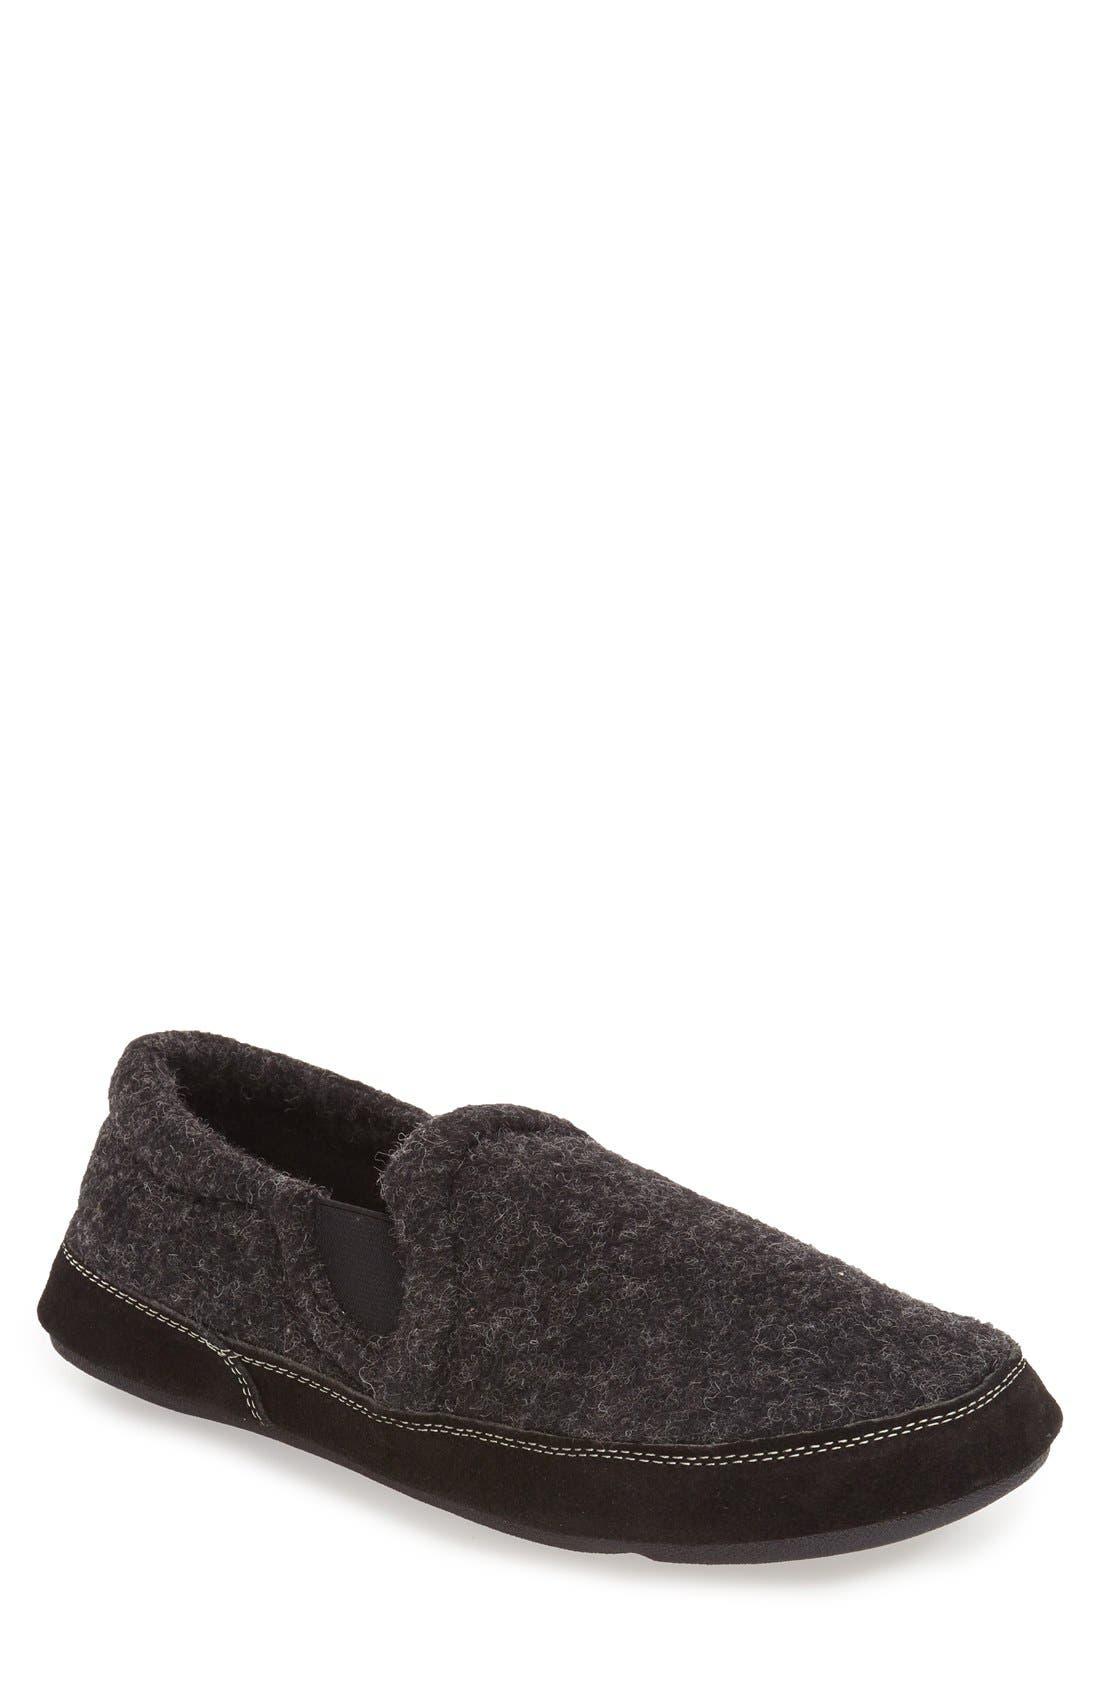 'Fave' Slipper,                         Main,                         color, BLACK